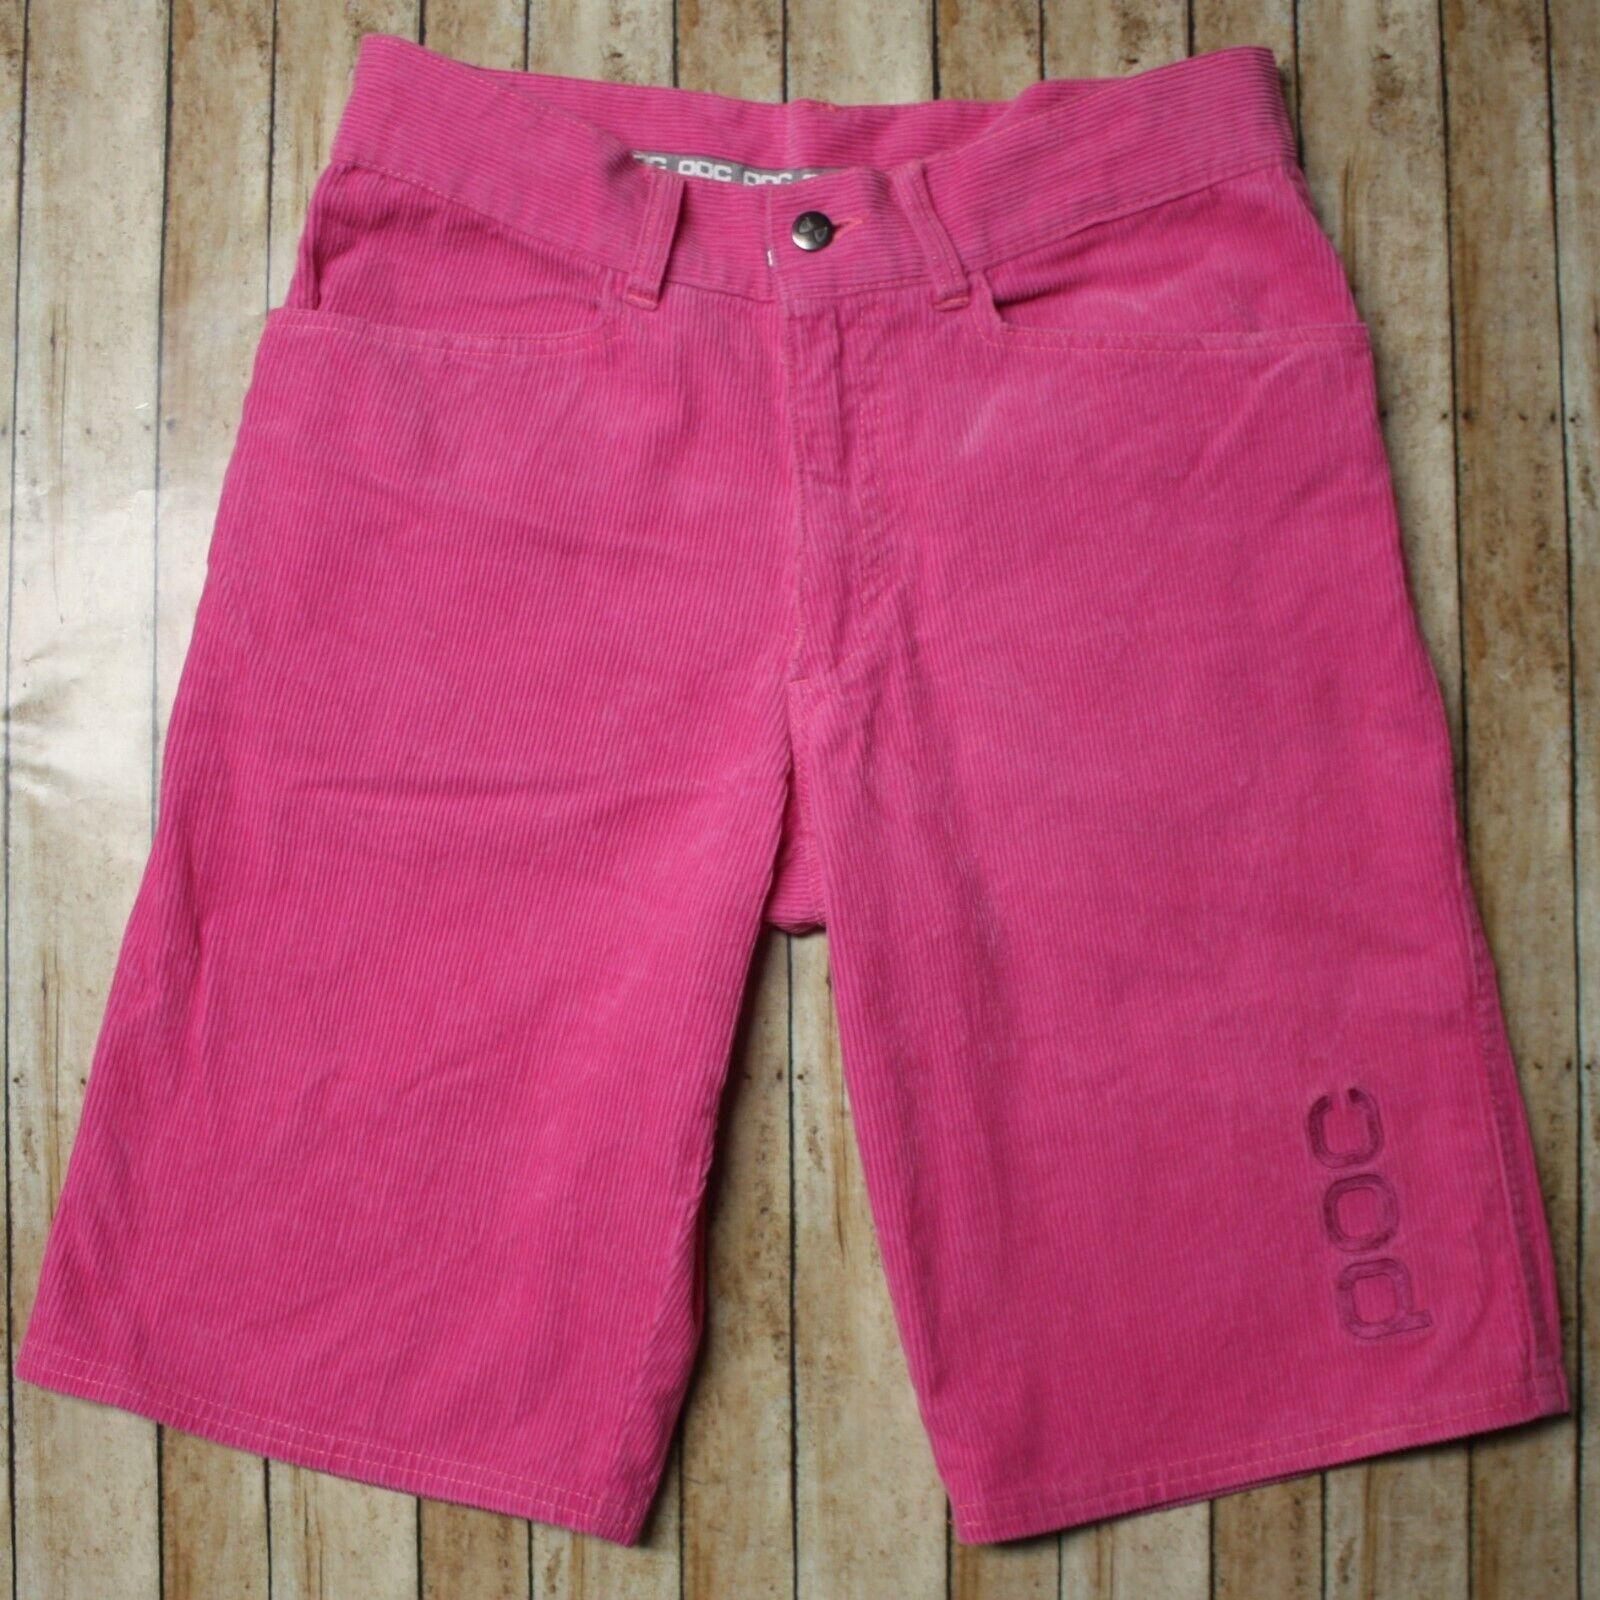 POC Air Shorts Corduroy Cotton Cycling Unisex Mens Womens 28 Pink